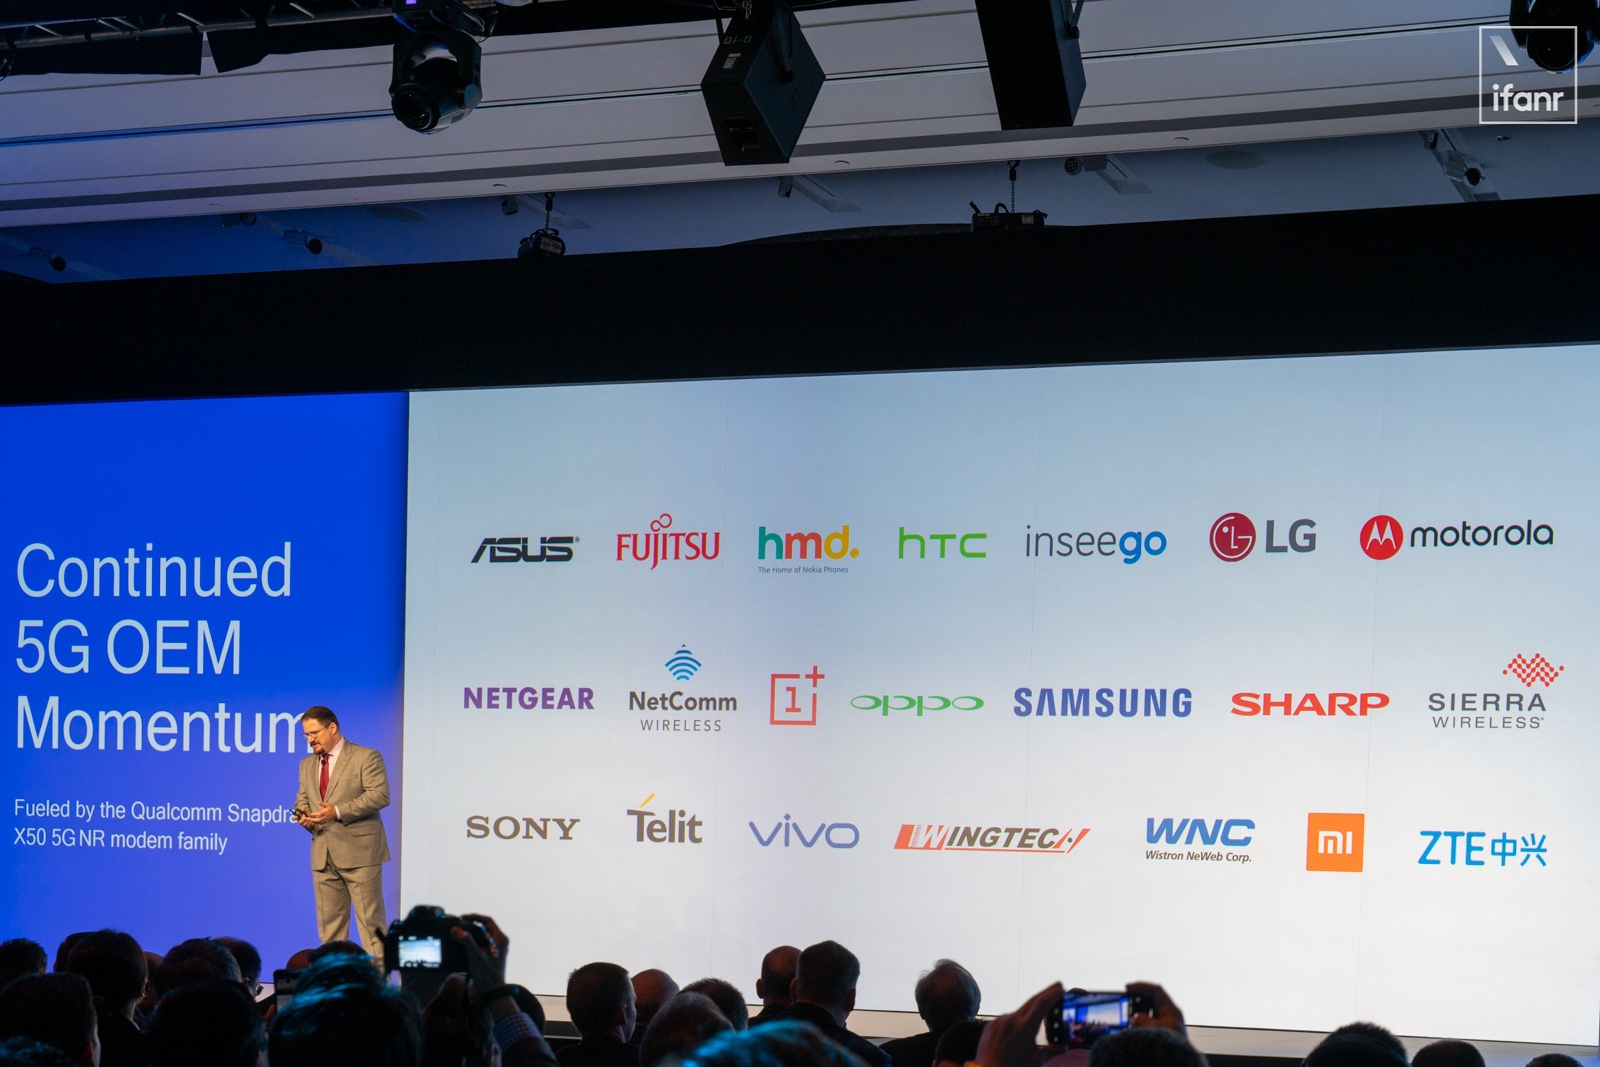 5G 时代的高通,想要覆盖 1000 亿美元的广阔市场  移动互联  第6张